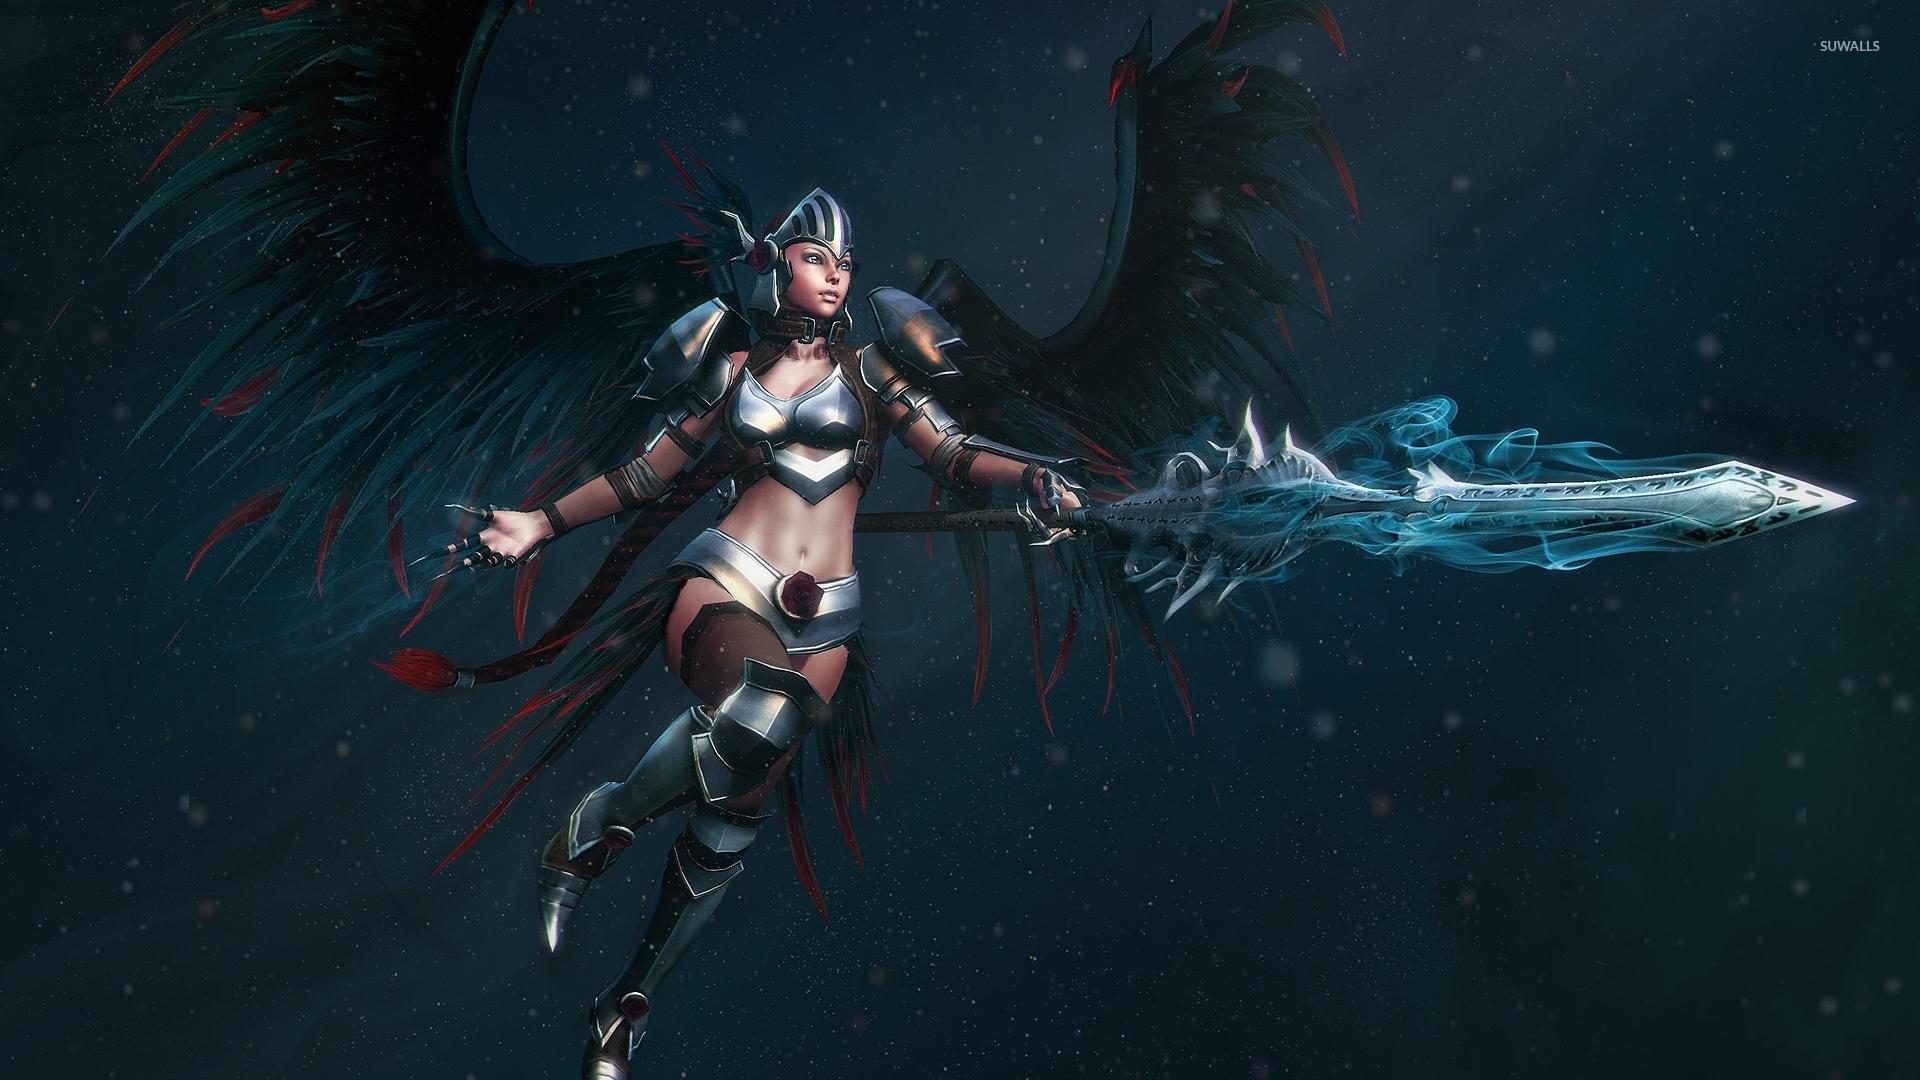 angel warrior sword wings - photo #30